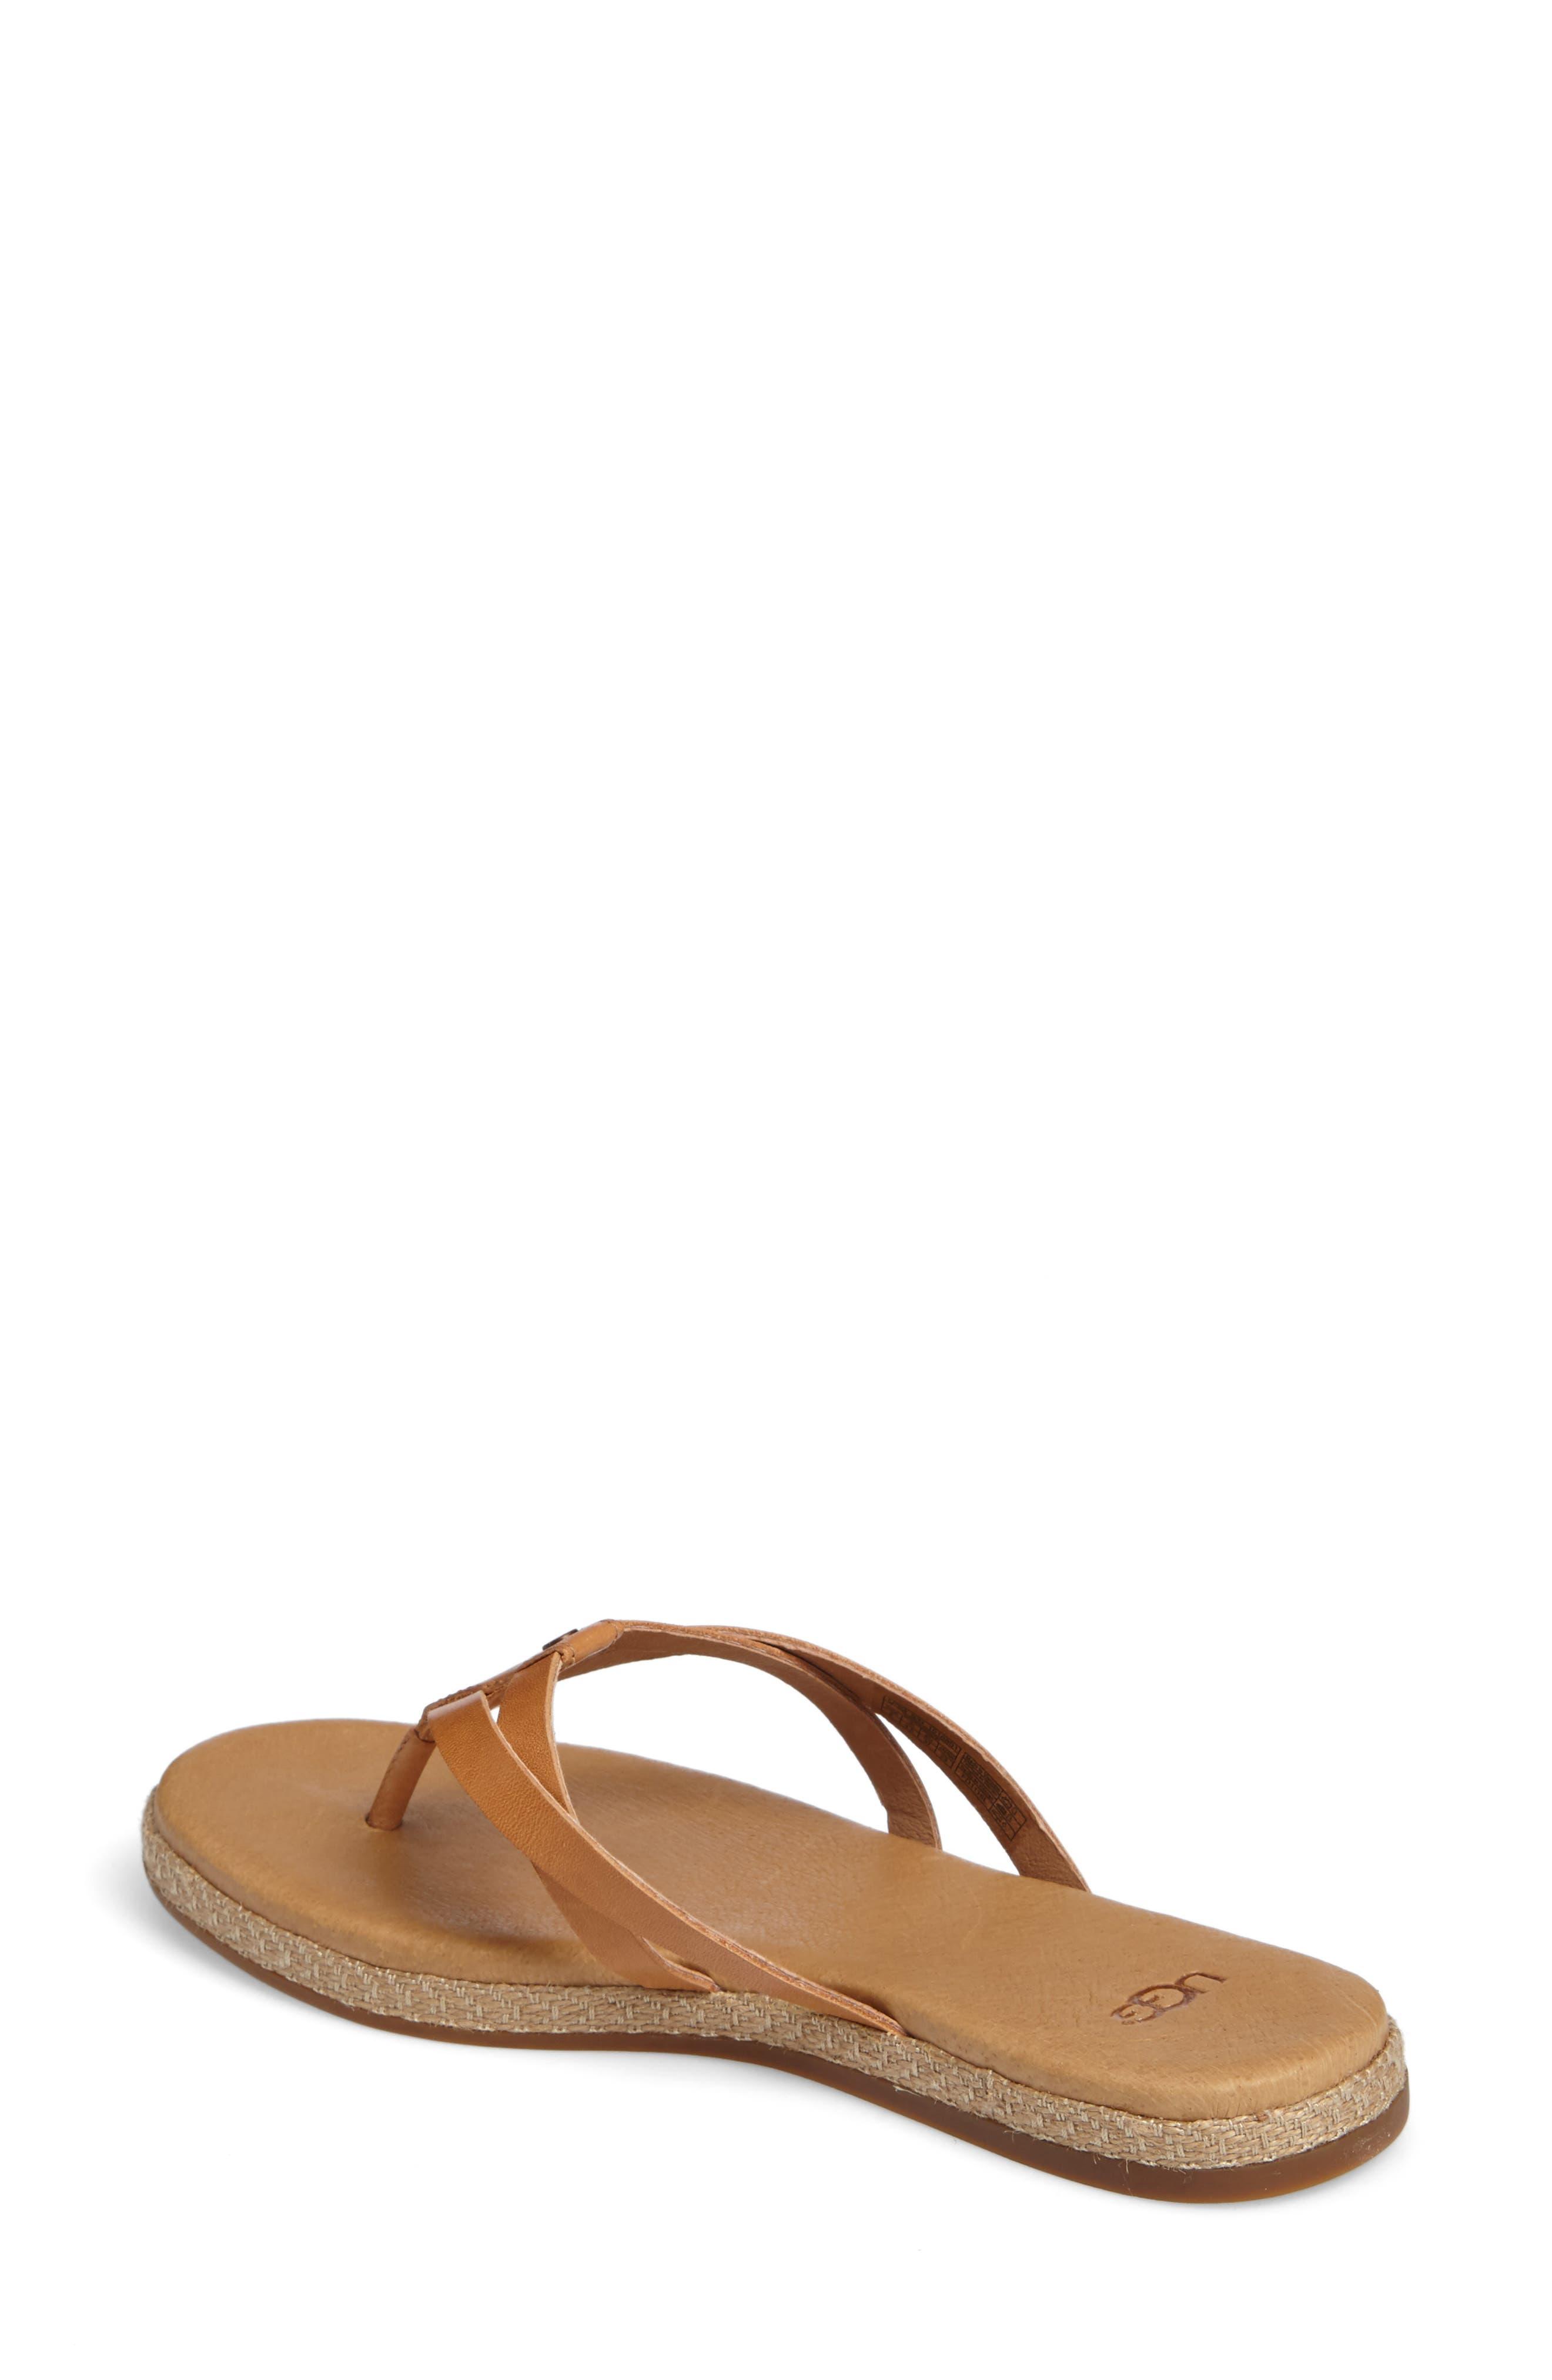 Annice Flip Flop,                             Alternate thumbnail 2, color,                             Cafe Leather